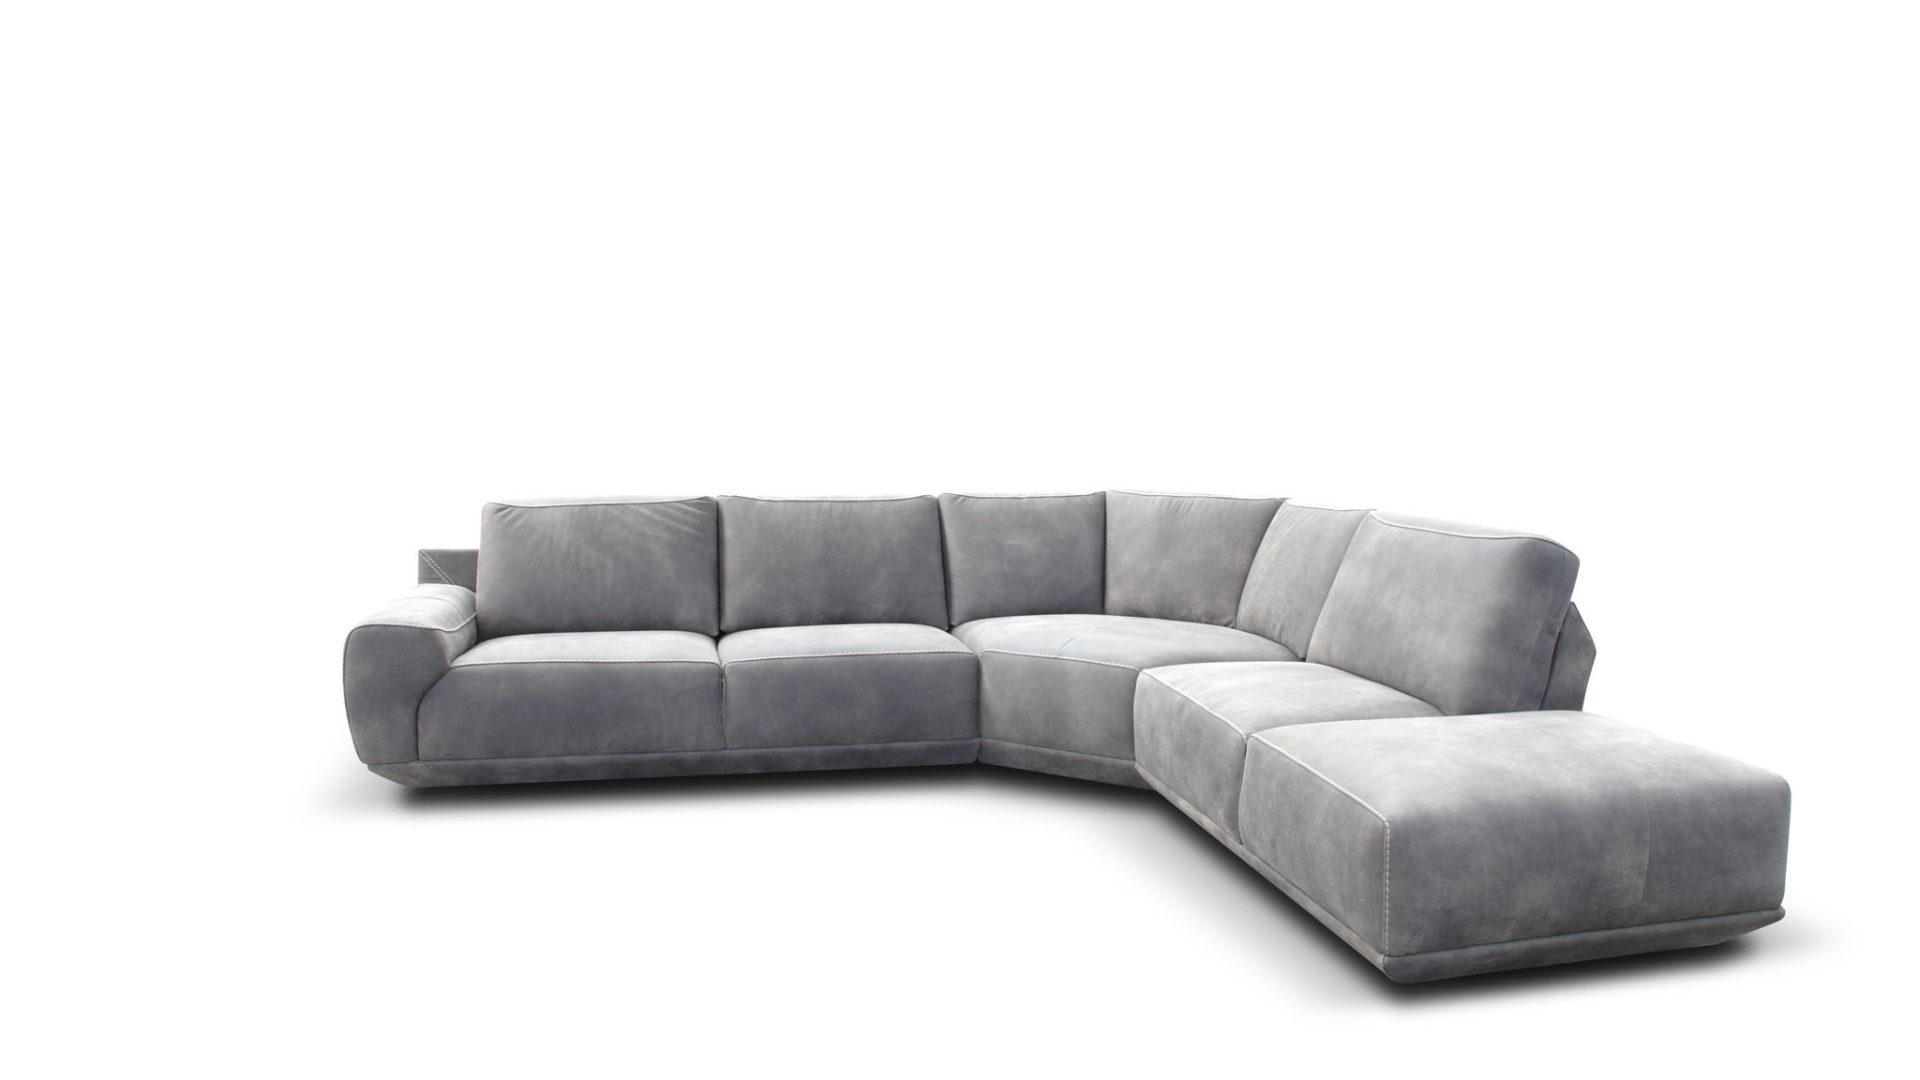 Bracci Sofas